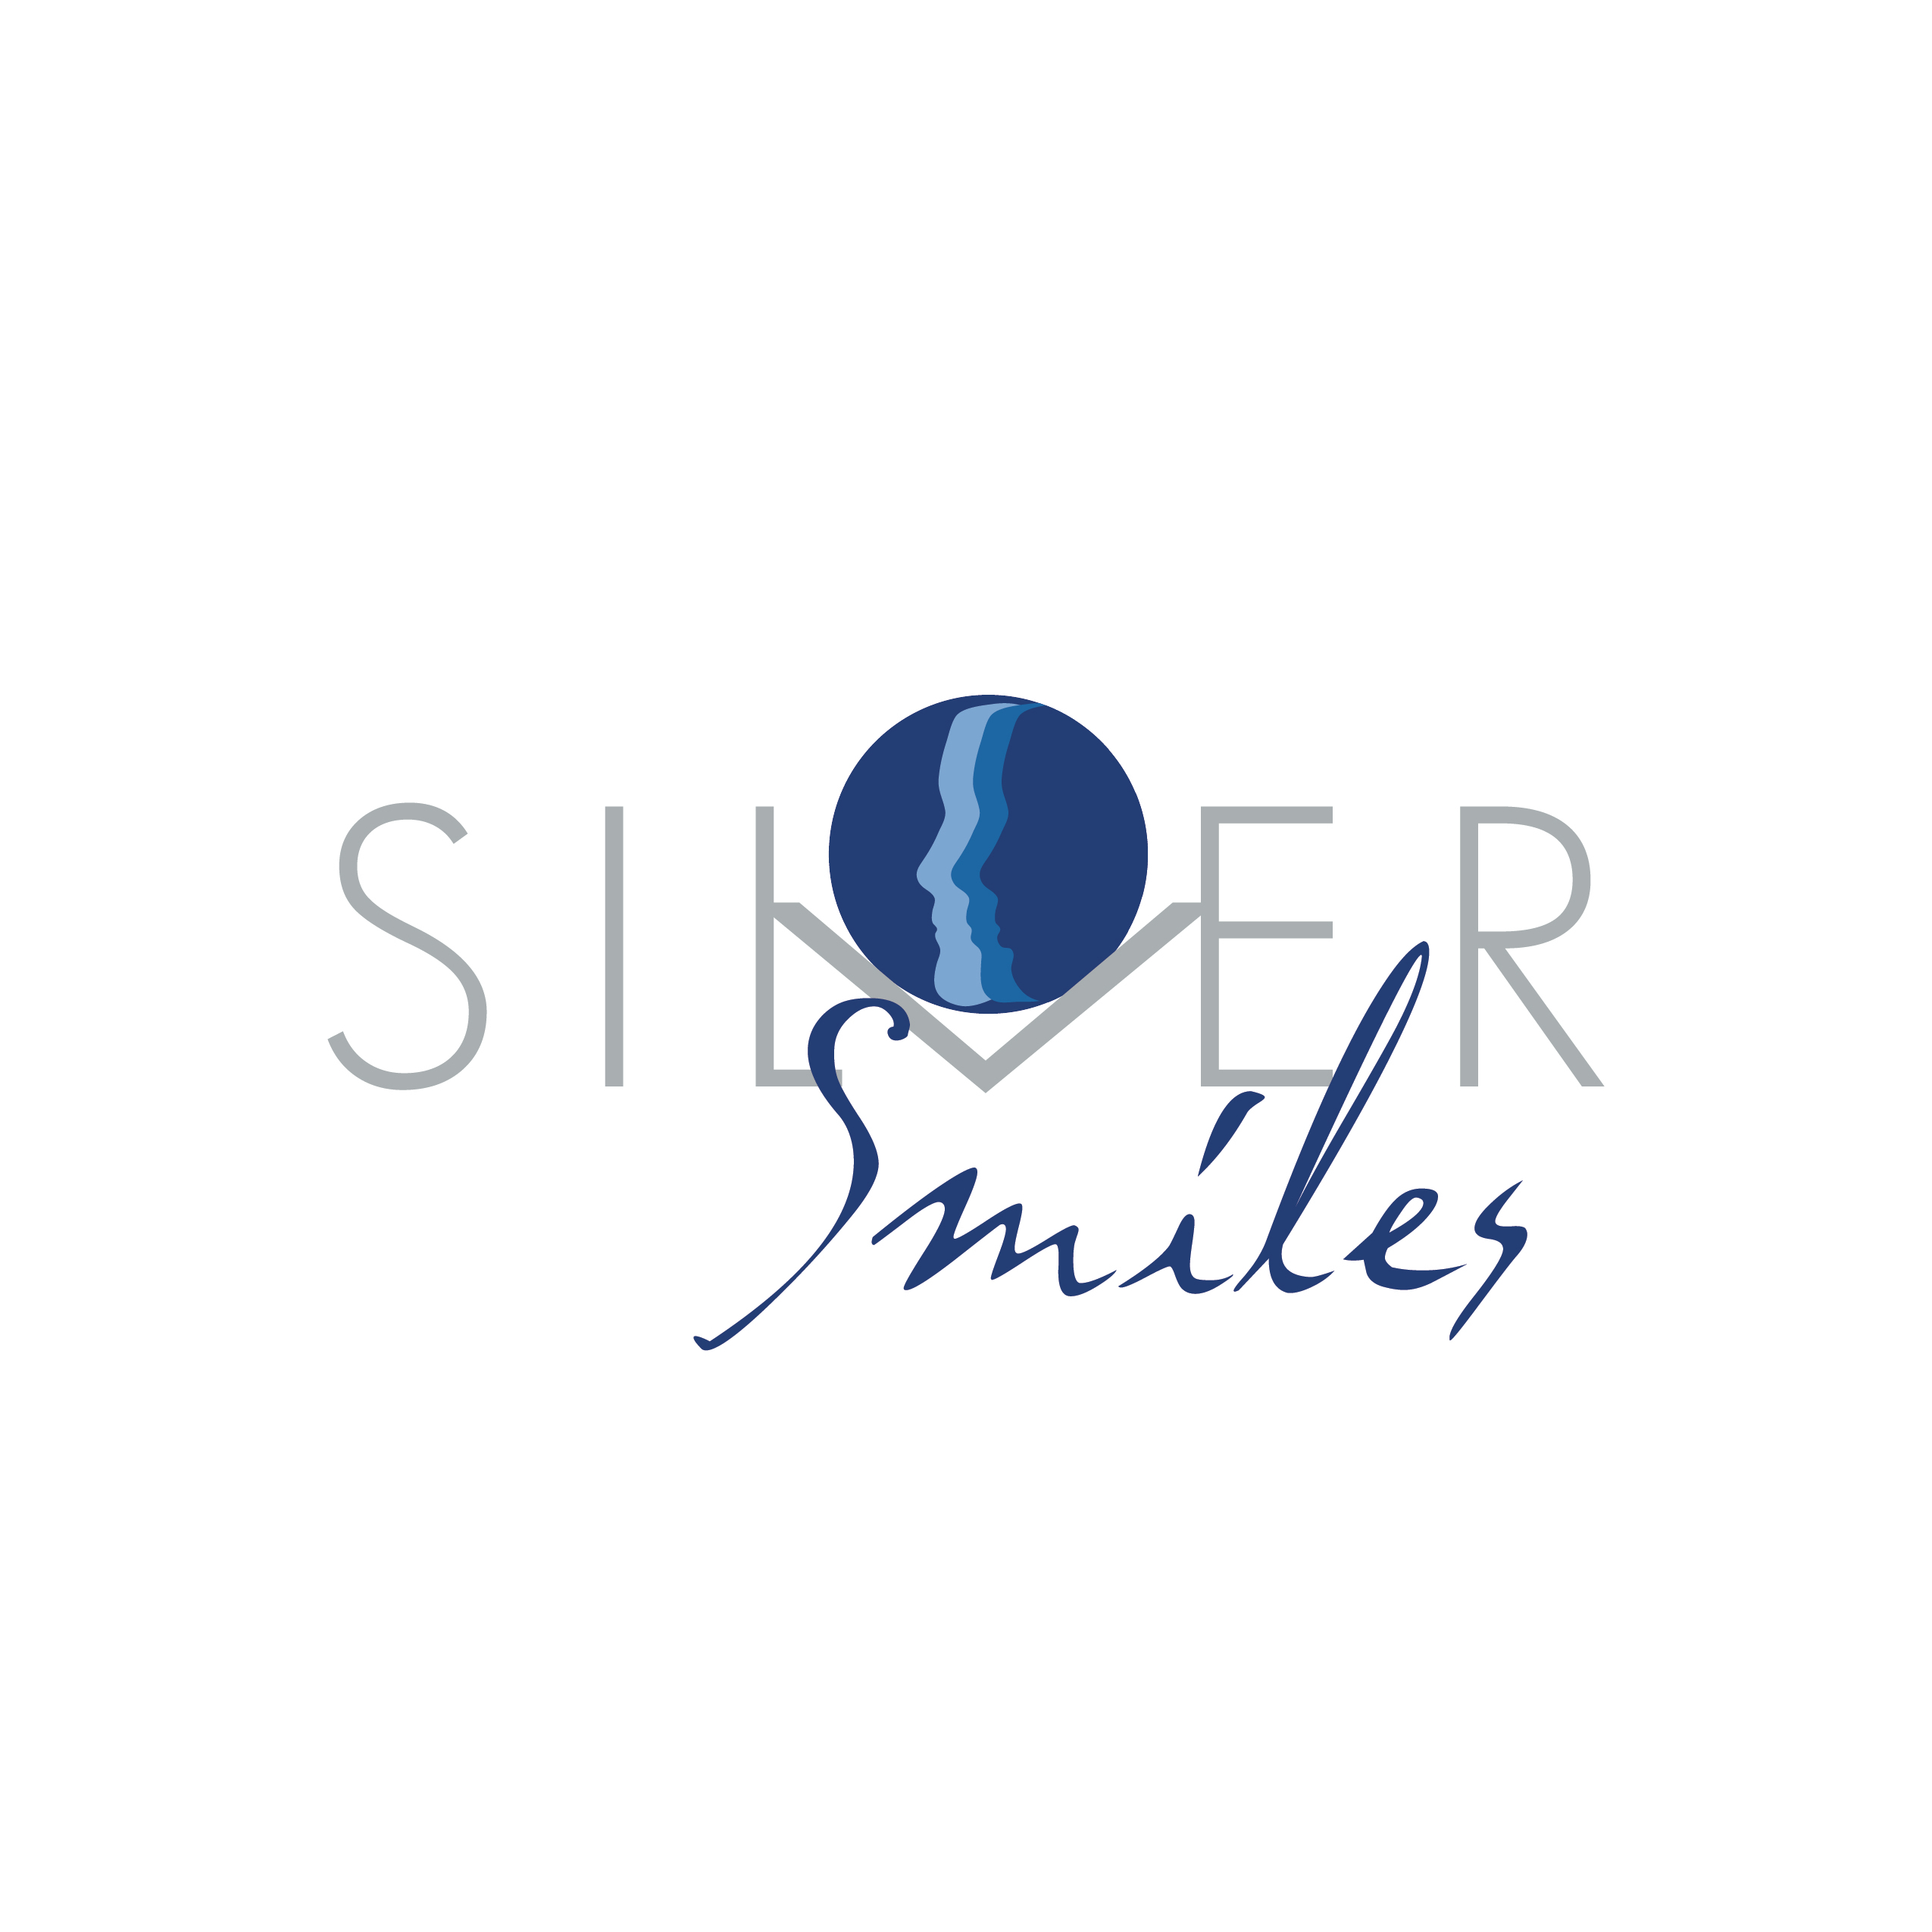 Silver Smiles - Arthur B. Silver DDS